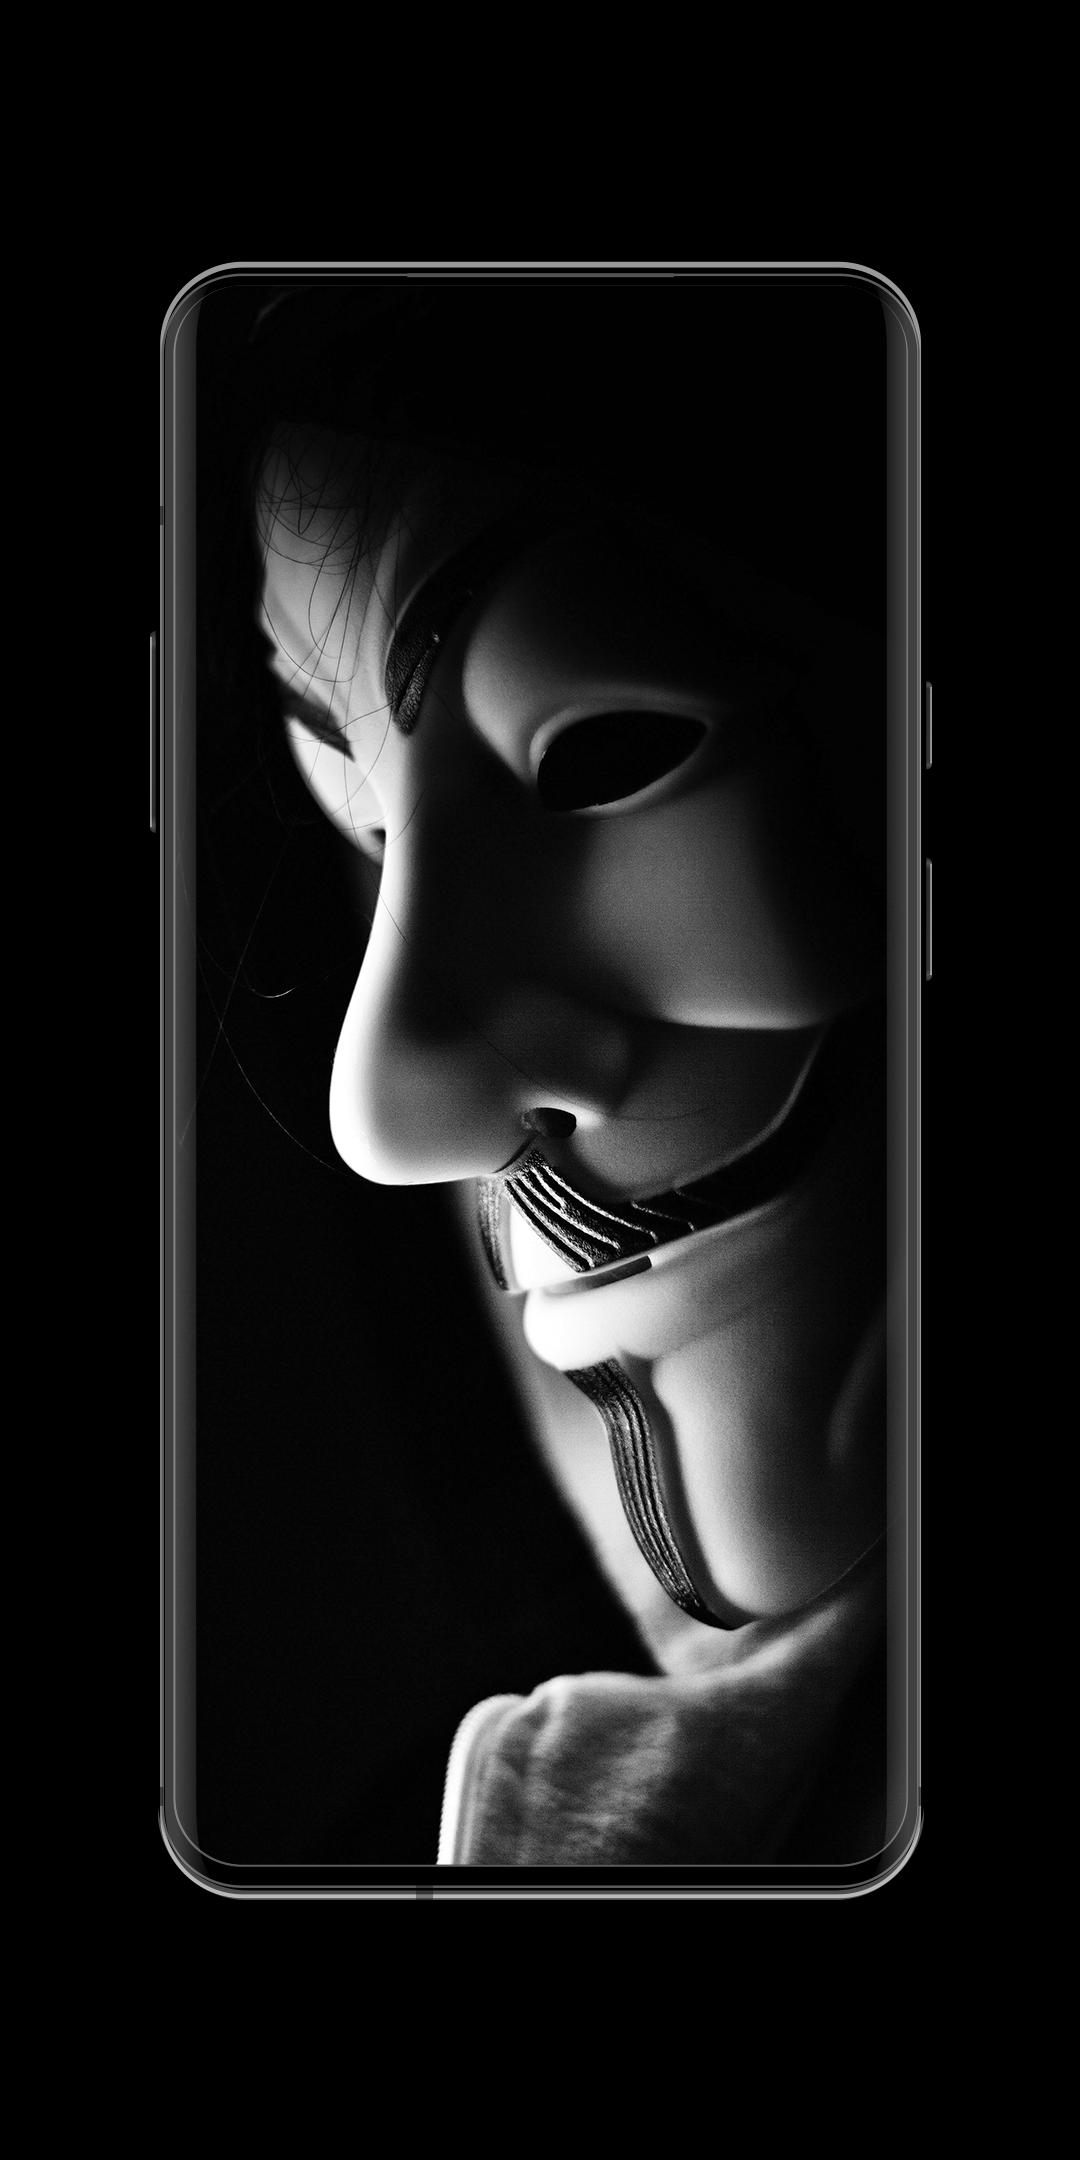 Black Wallpapers 4k Dark Amoled Backgrounds Apk 5 2 33 Download For Android Download Black Wallpapers 4k Dark Amoled Backgrounds Xapk Apk Bundle Latest Version Apkfab Com